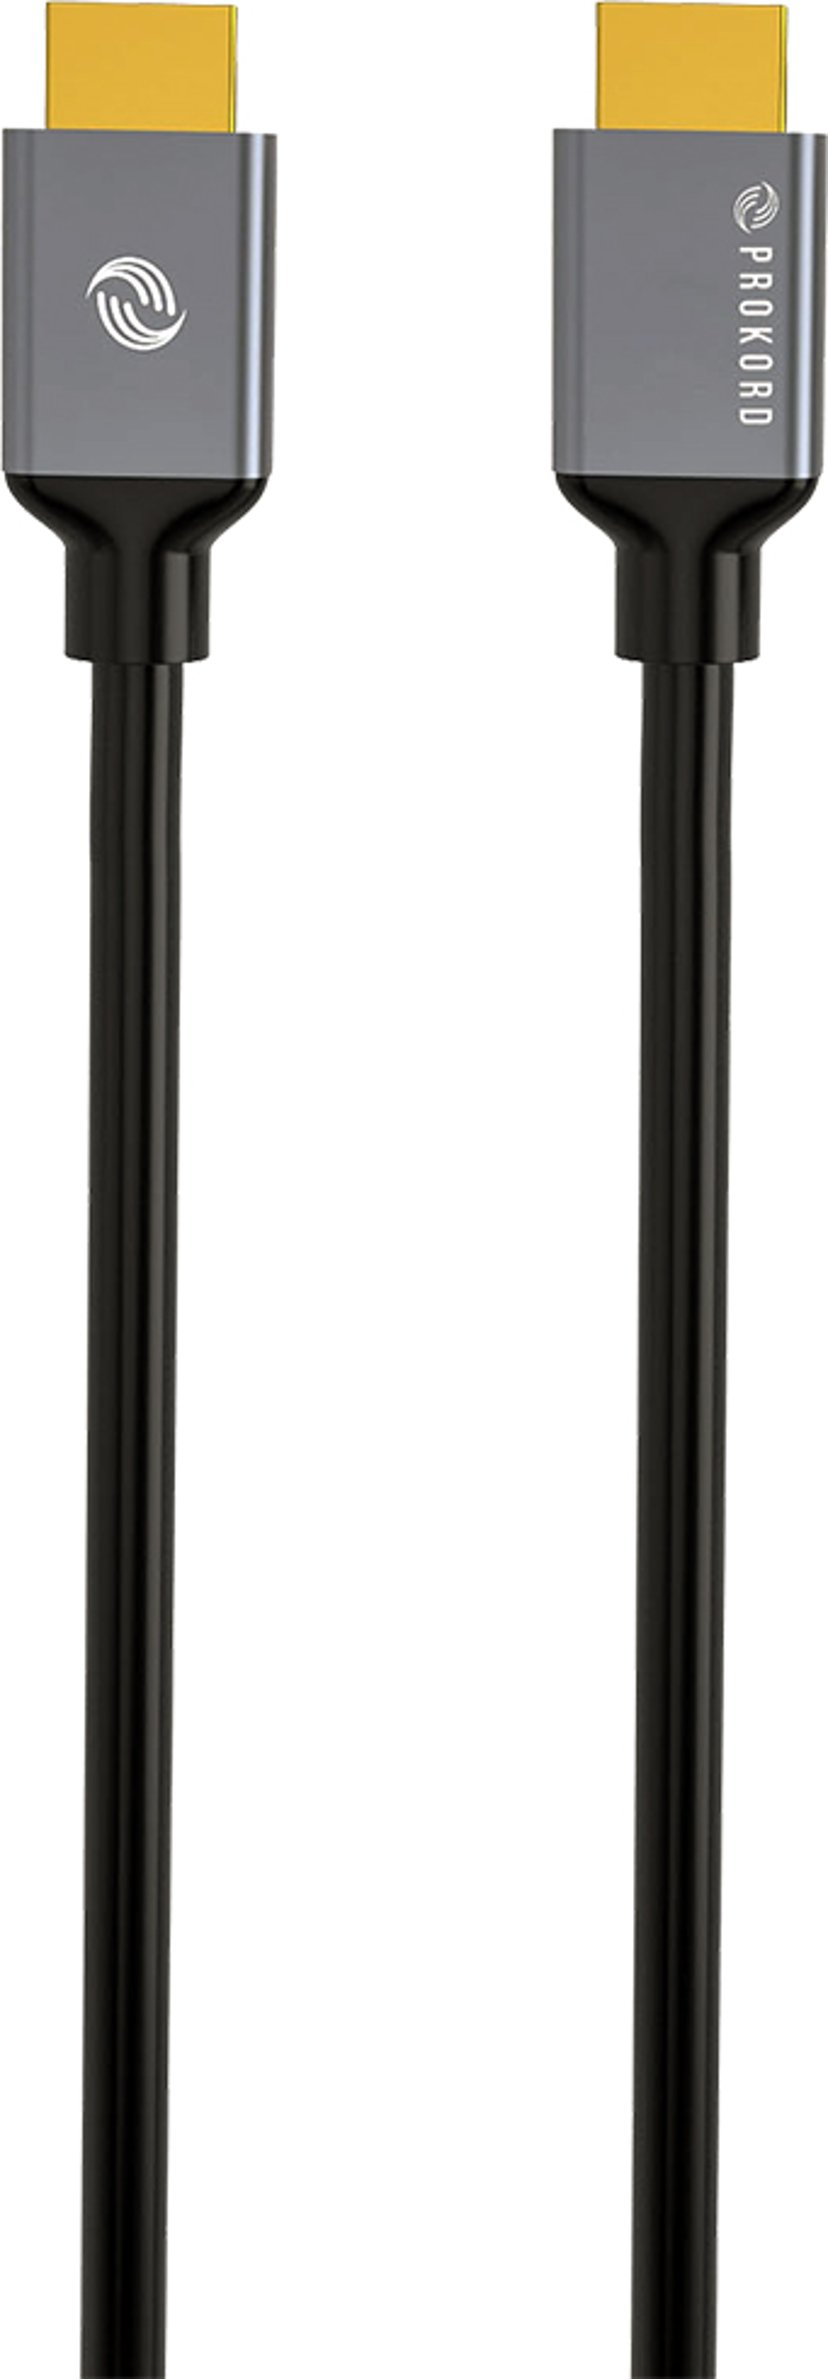 Prokord Black HDMI 2.0 3.0m 3m HDMI Hane HDMI Hane